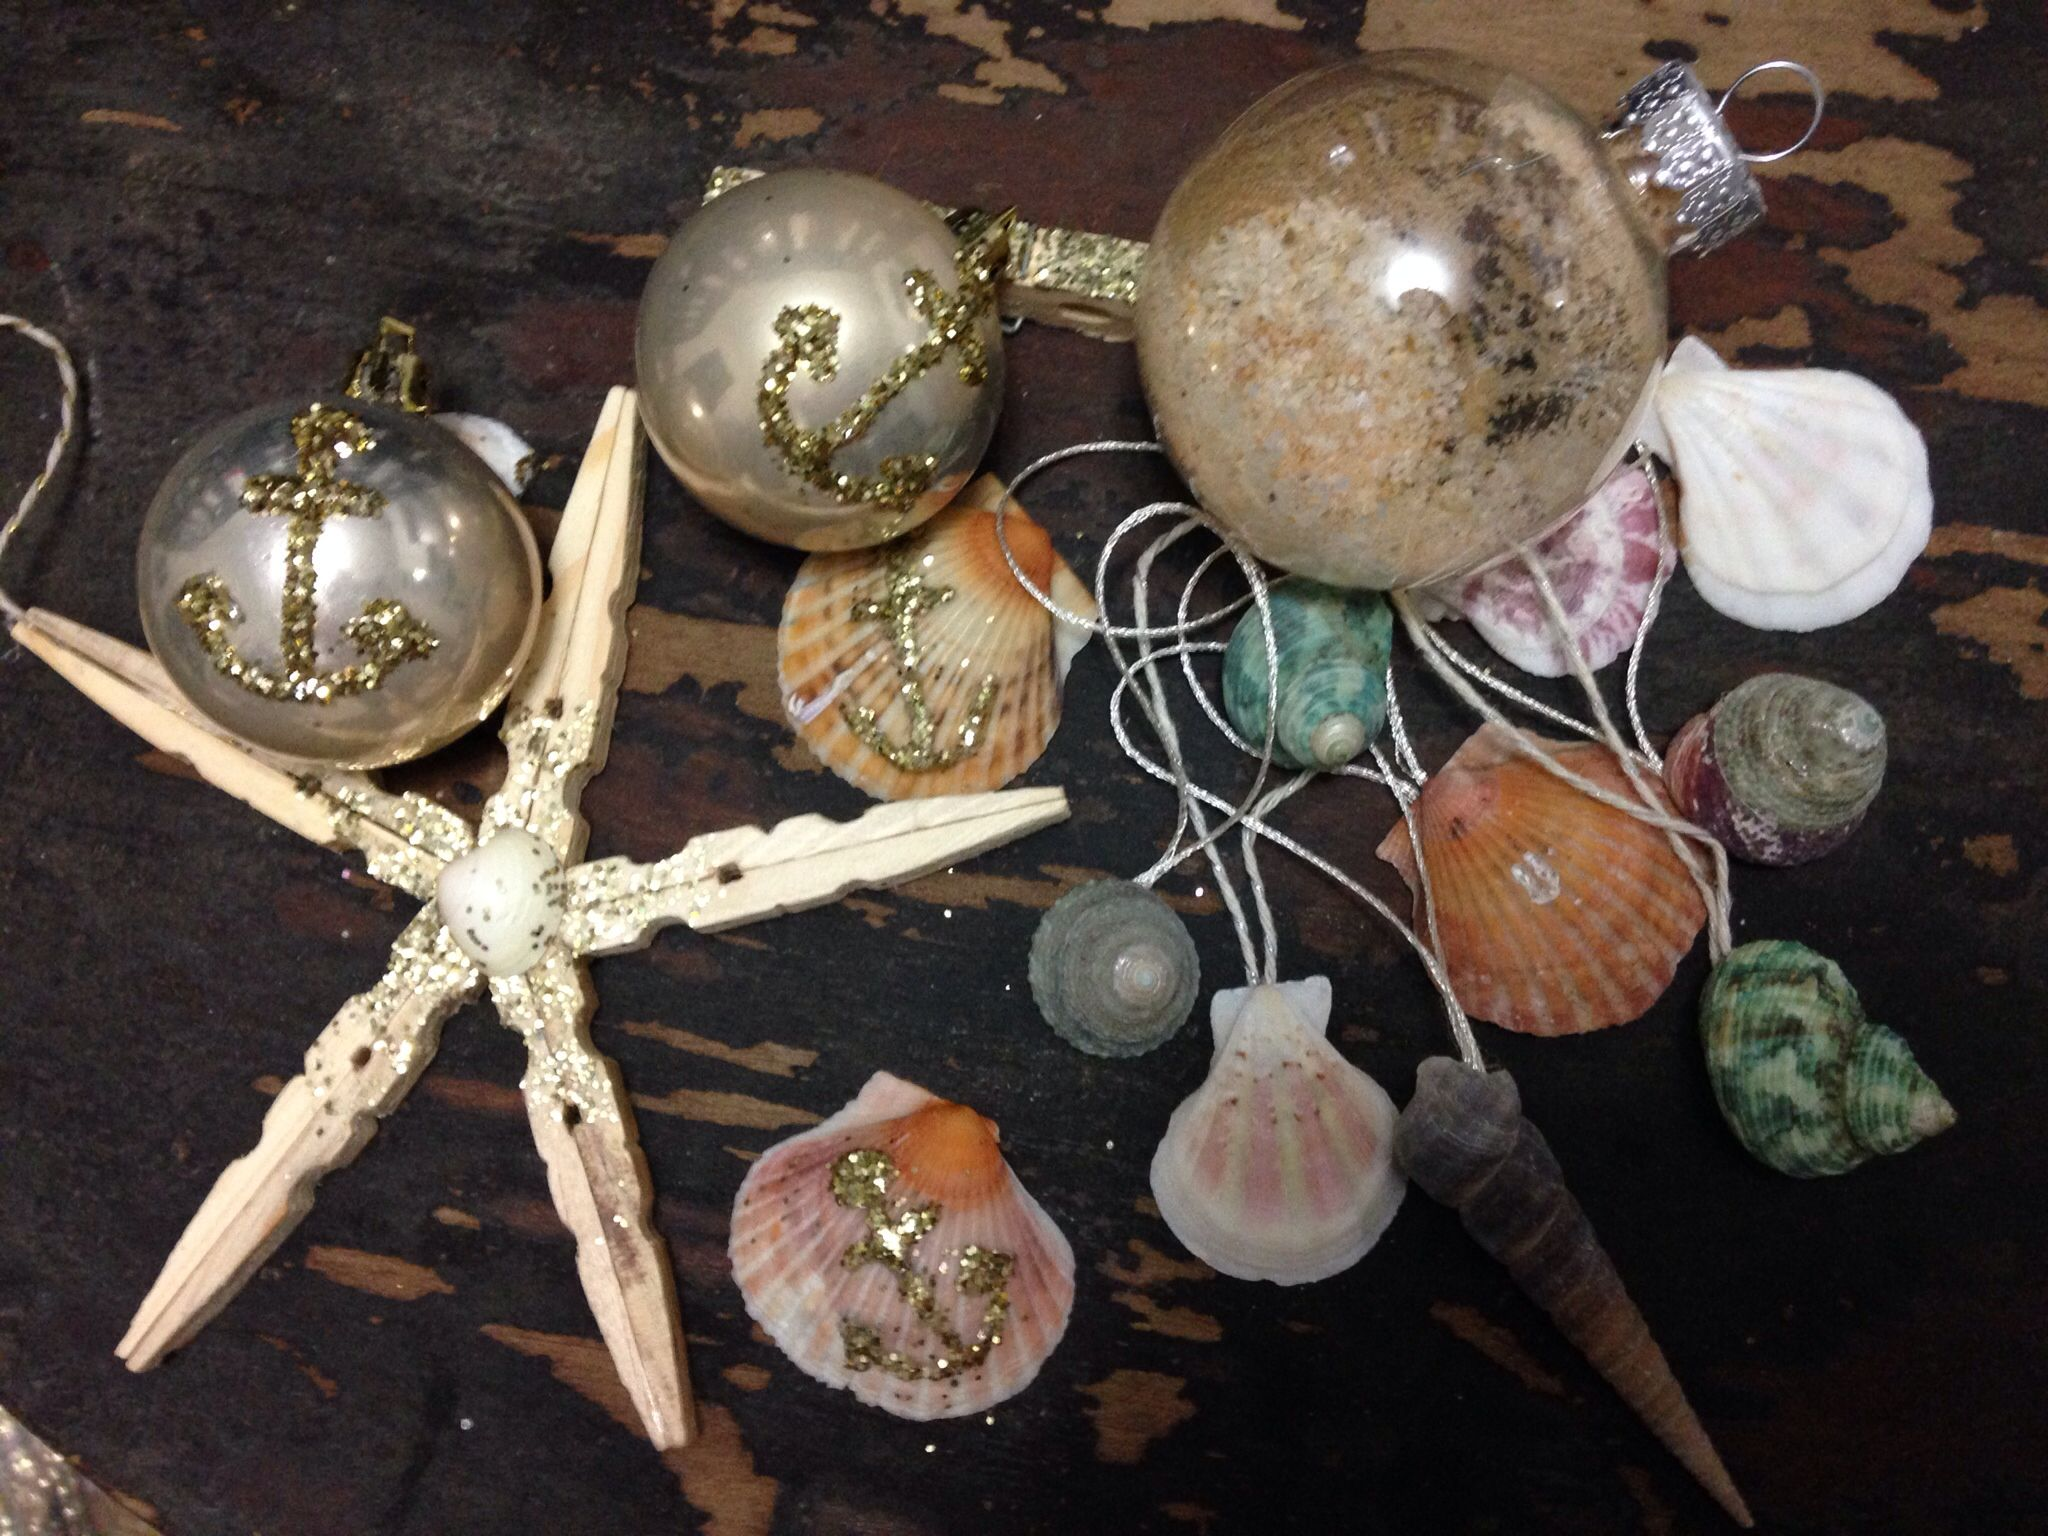 Christmas by the seashore ornaments